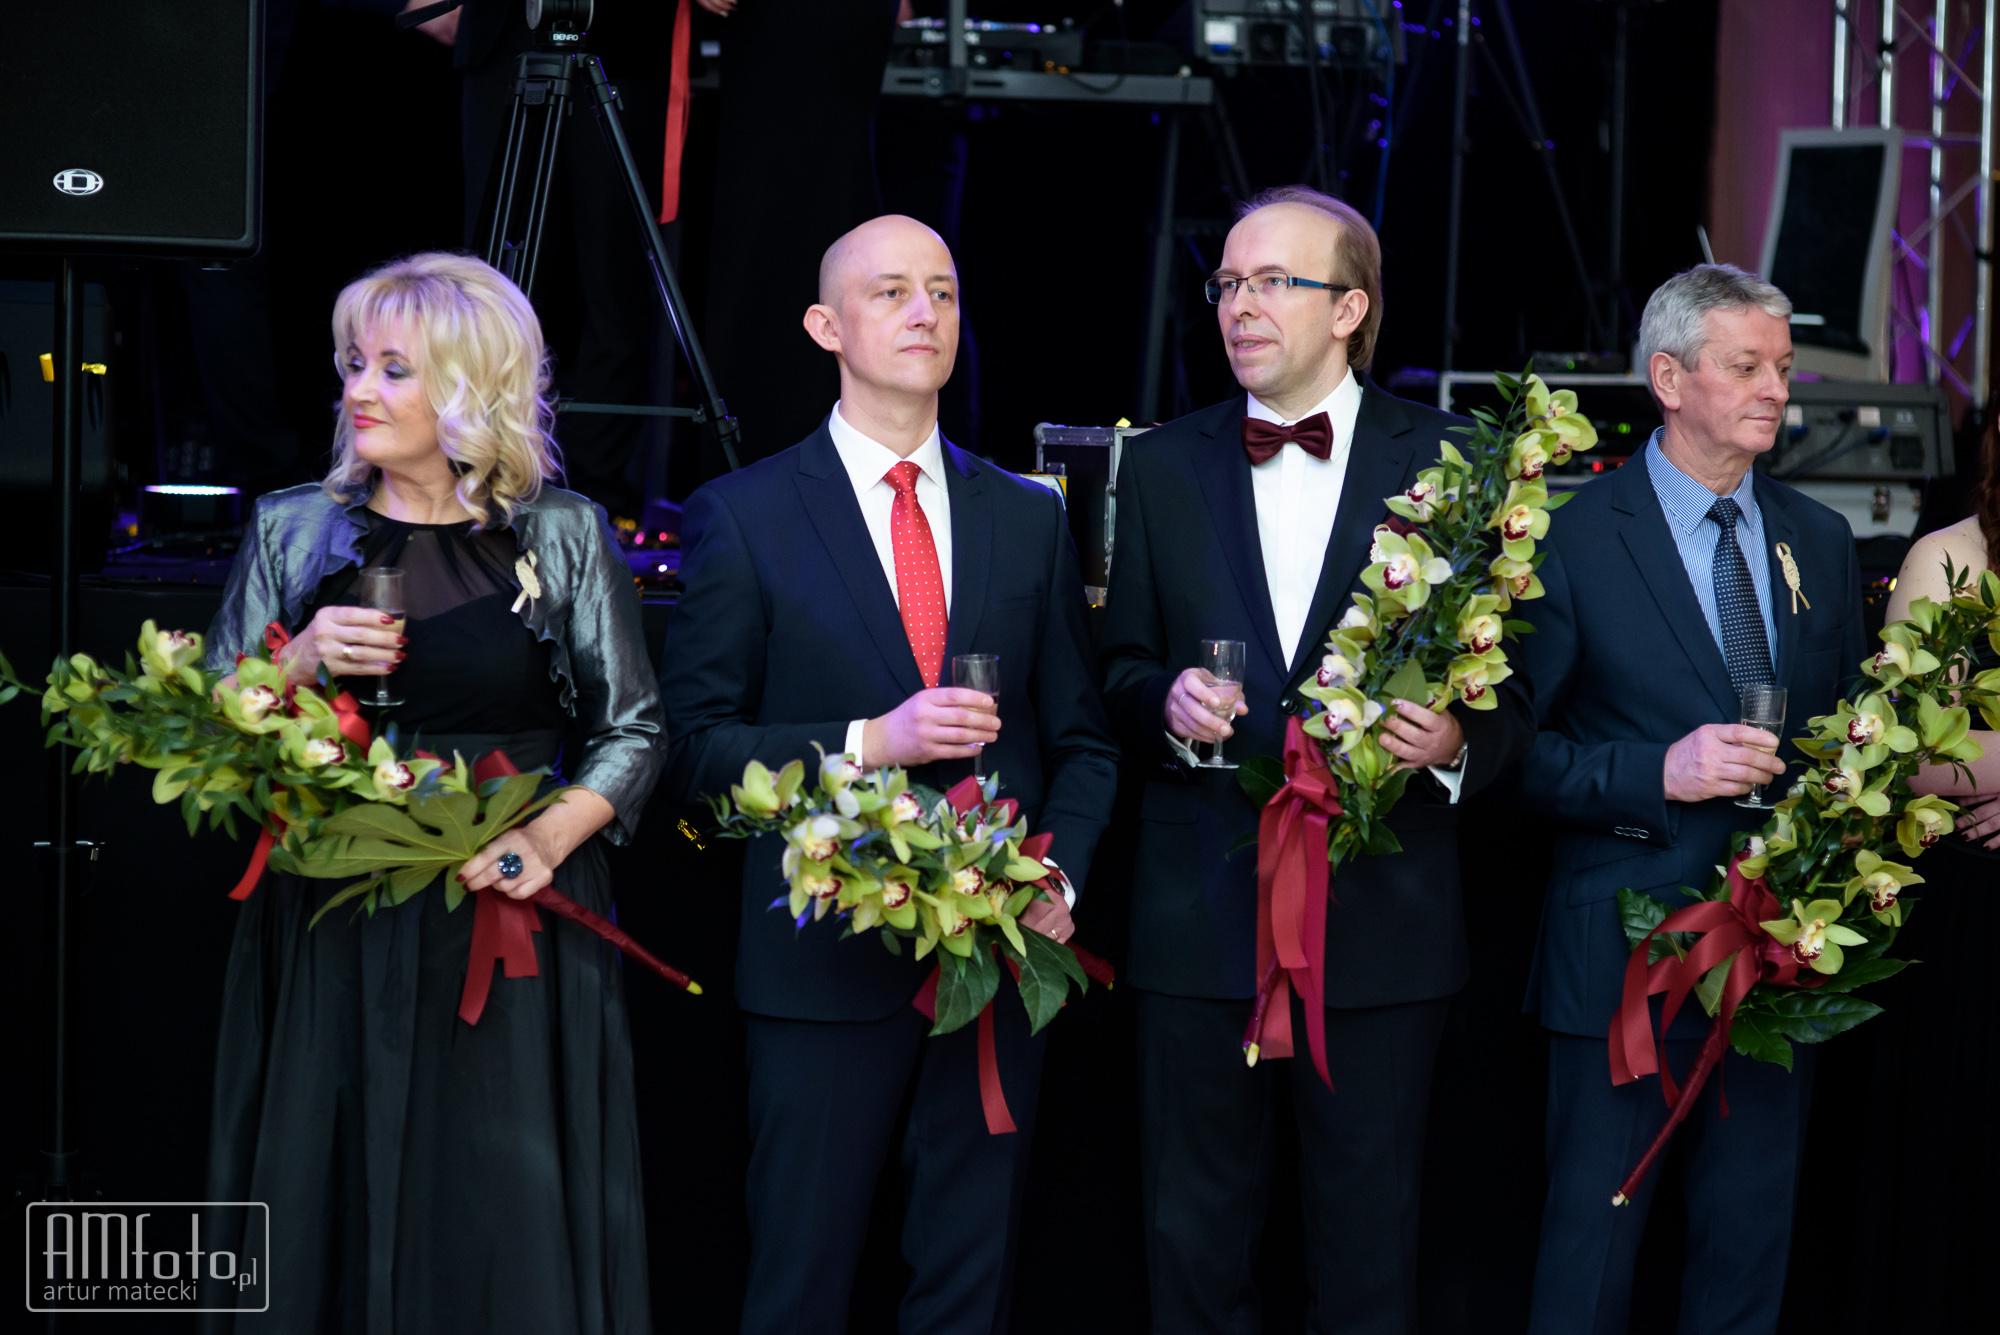 studniowka_2017_3LO_Kalisz_reportaz__www_amfoto_pl-0681.jpg